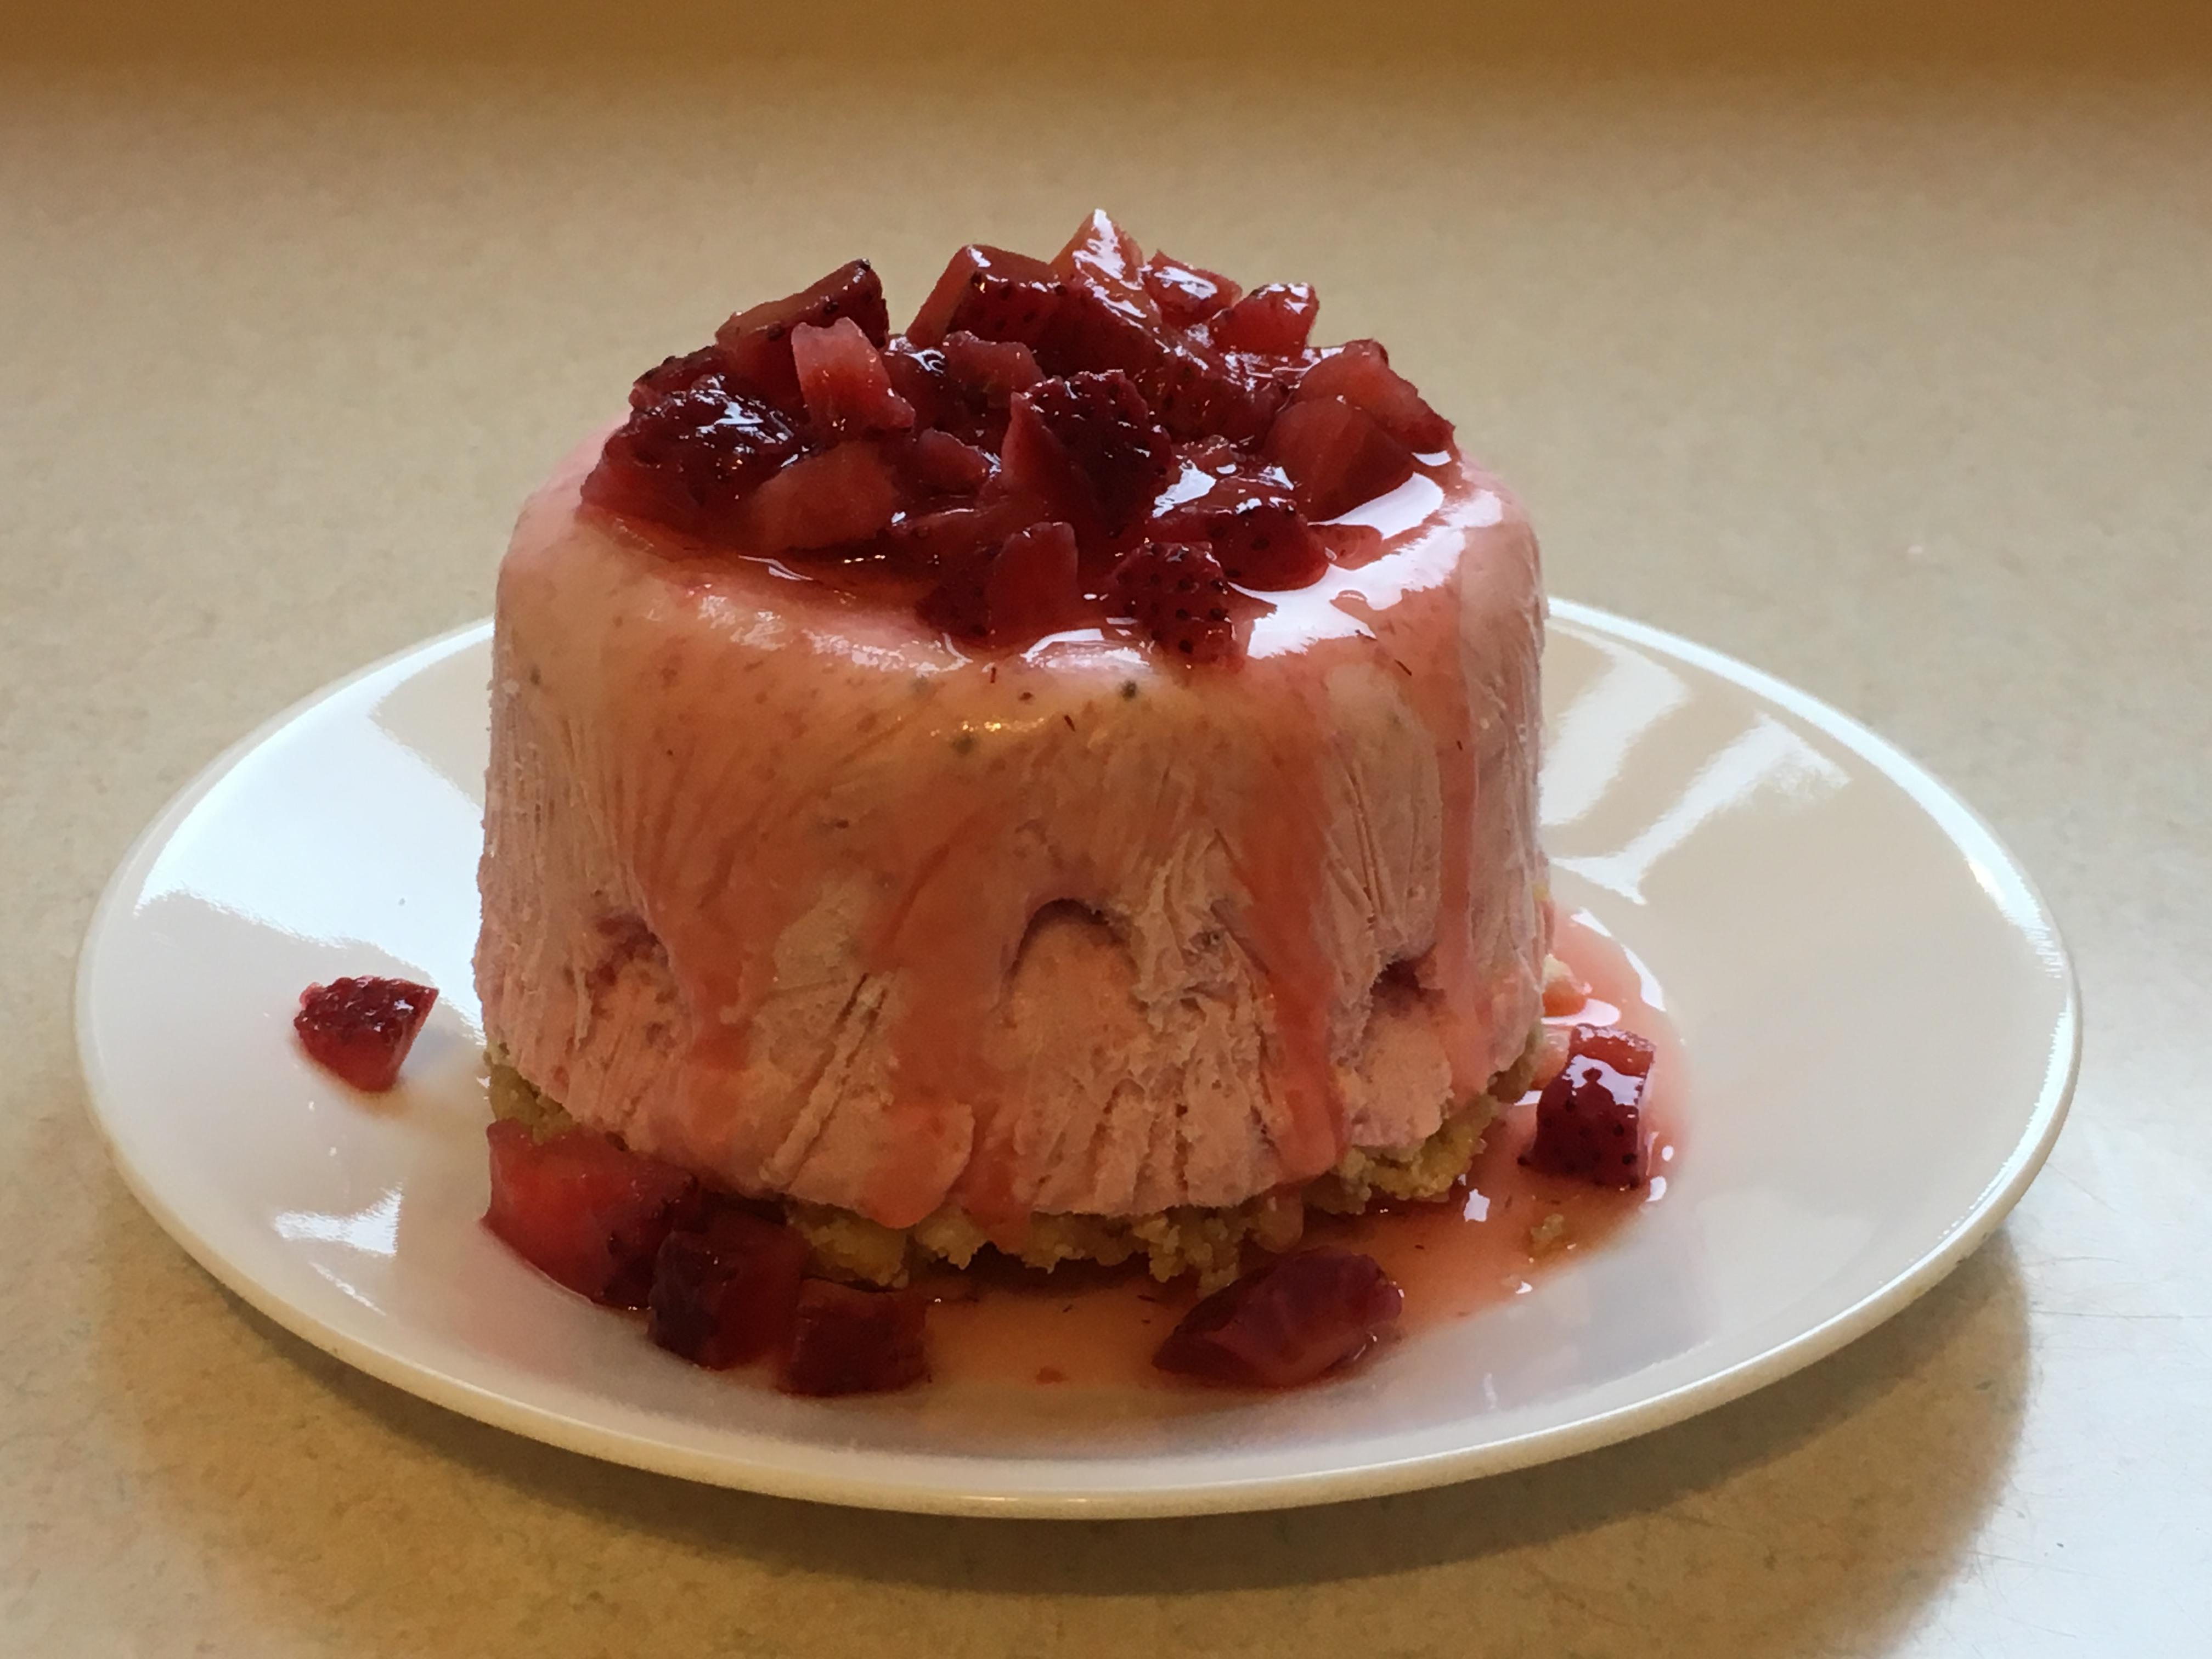 Chef John's Strawberry Semifreddo wheezer